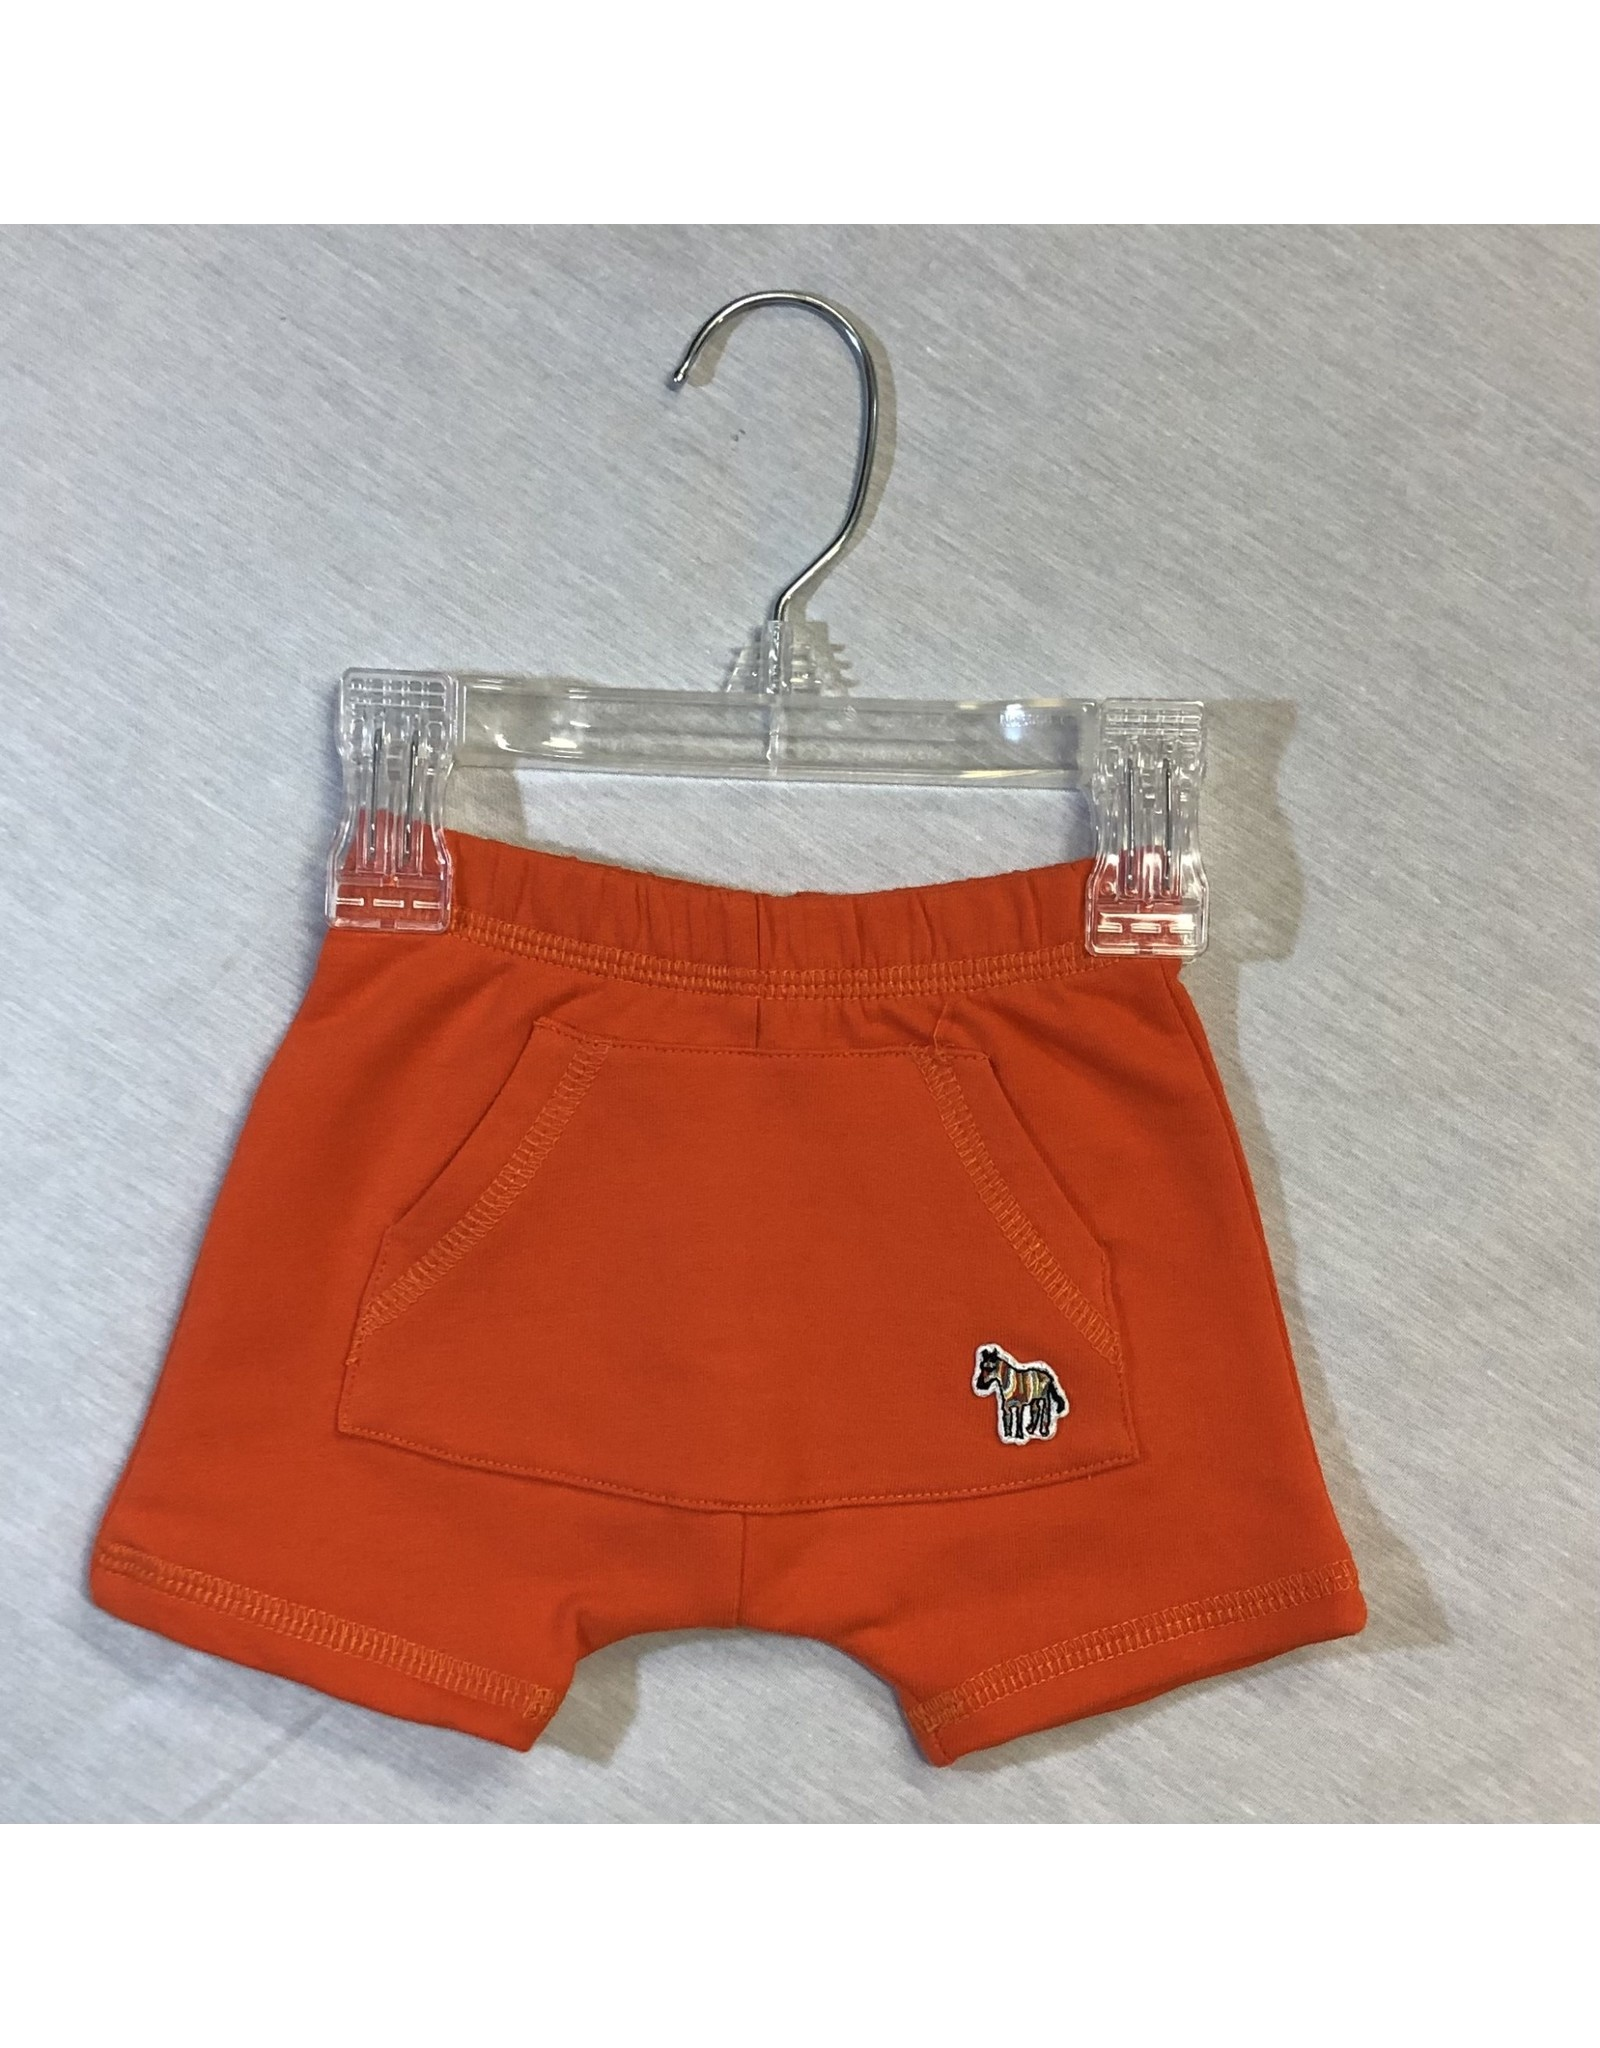 Paul Smith Orange Shorts with Zebra